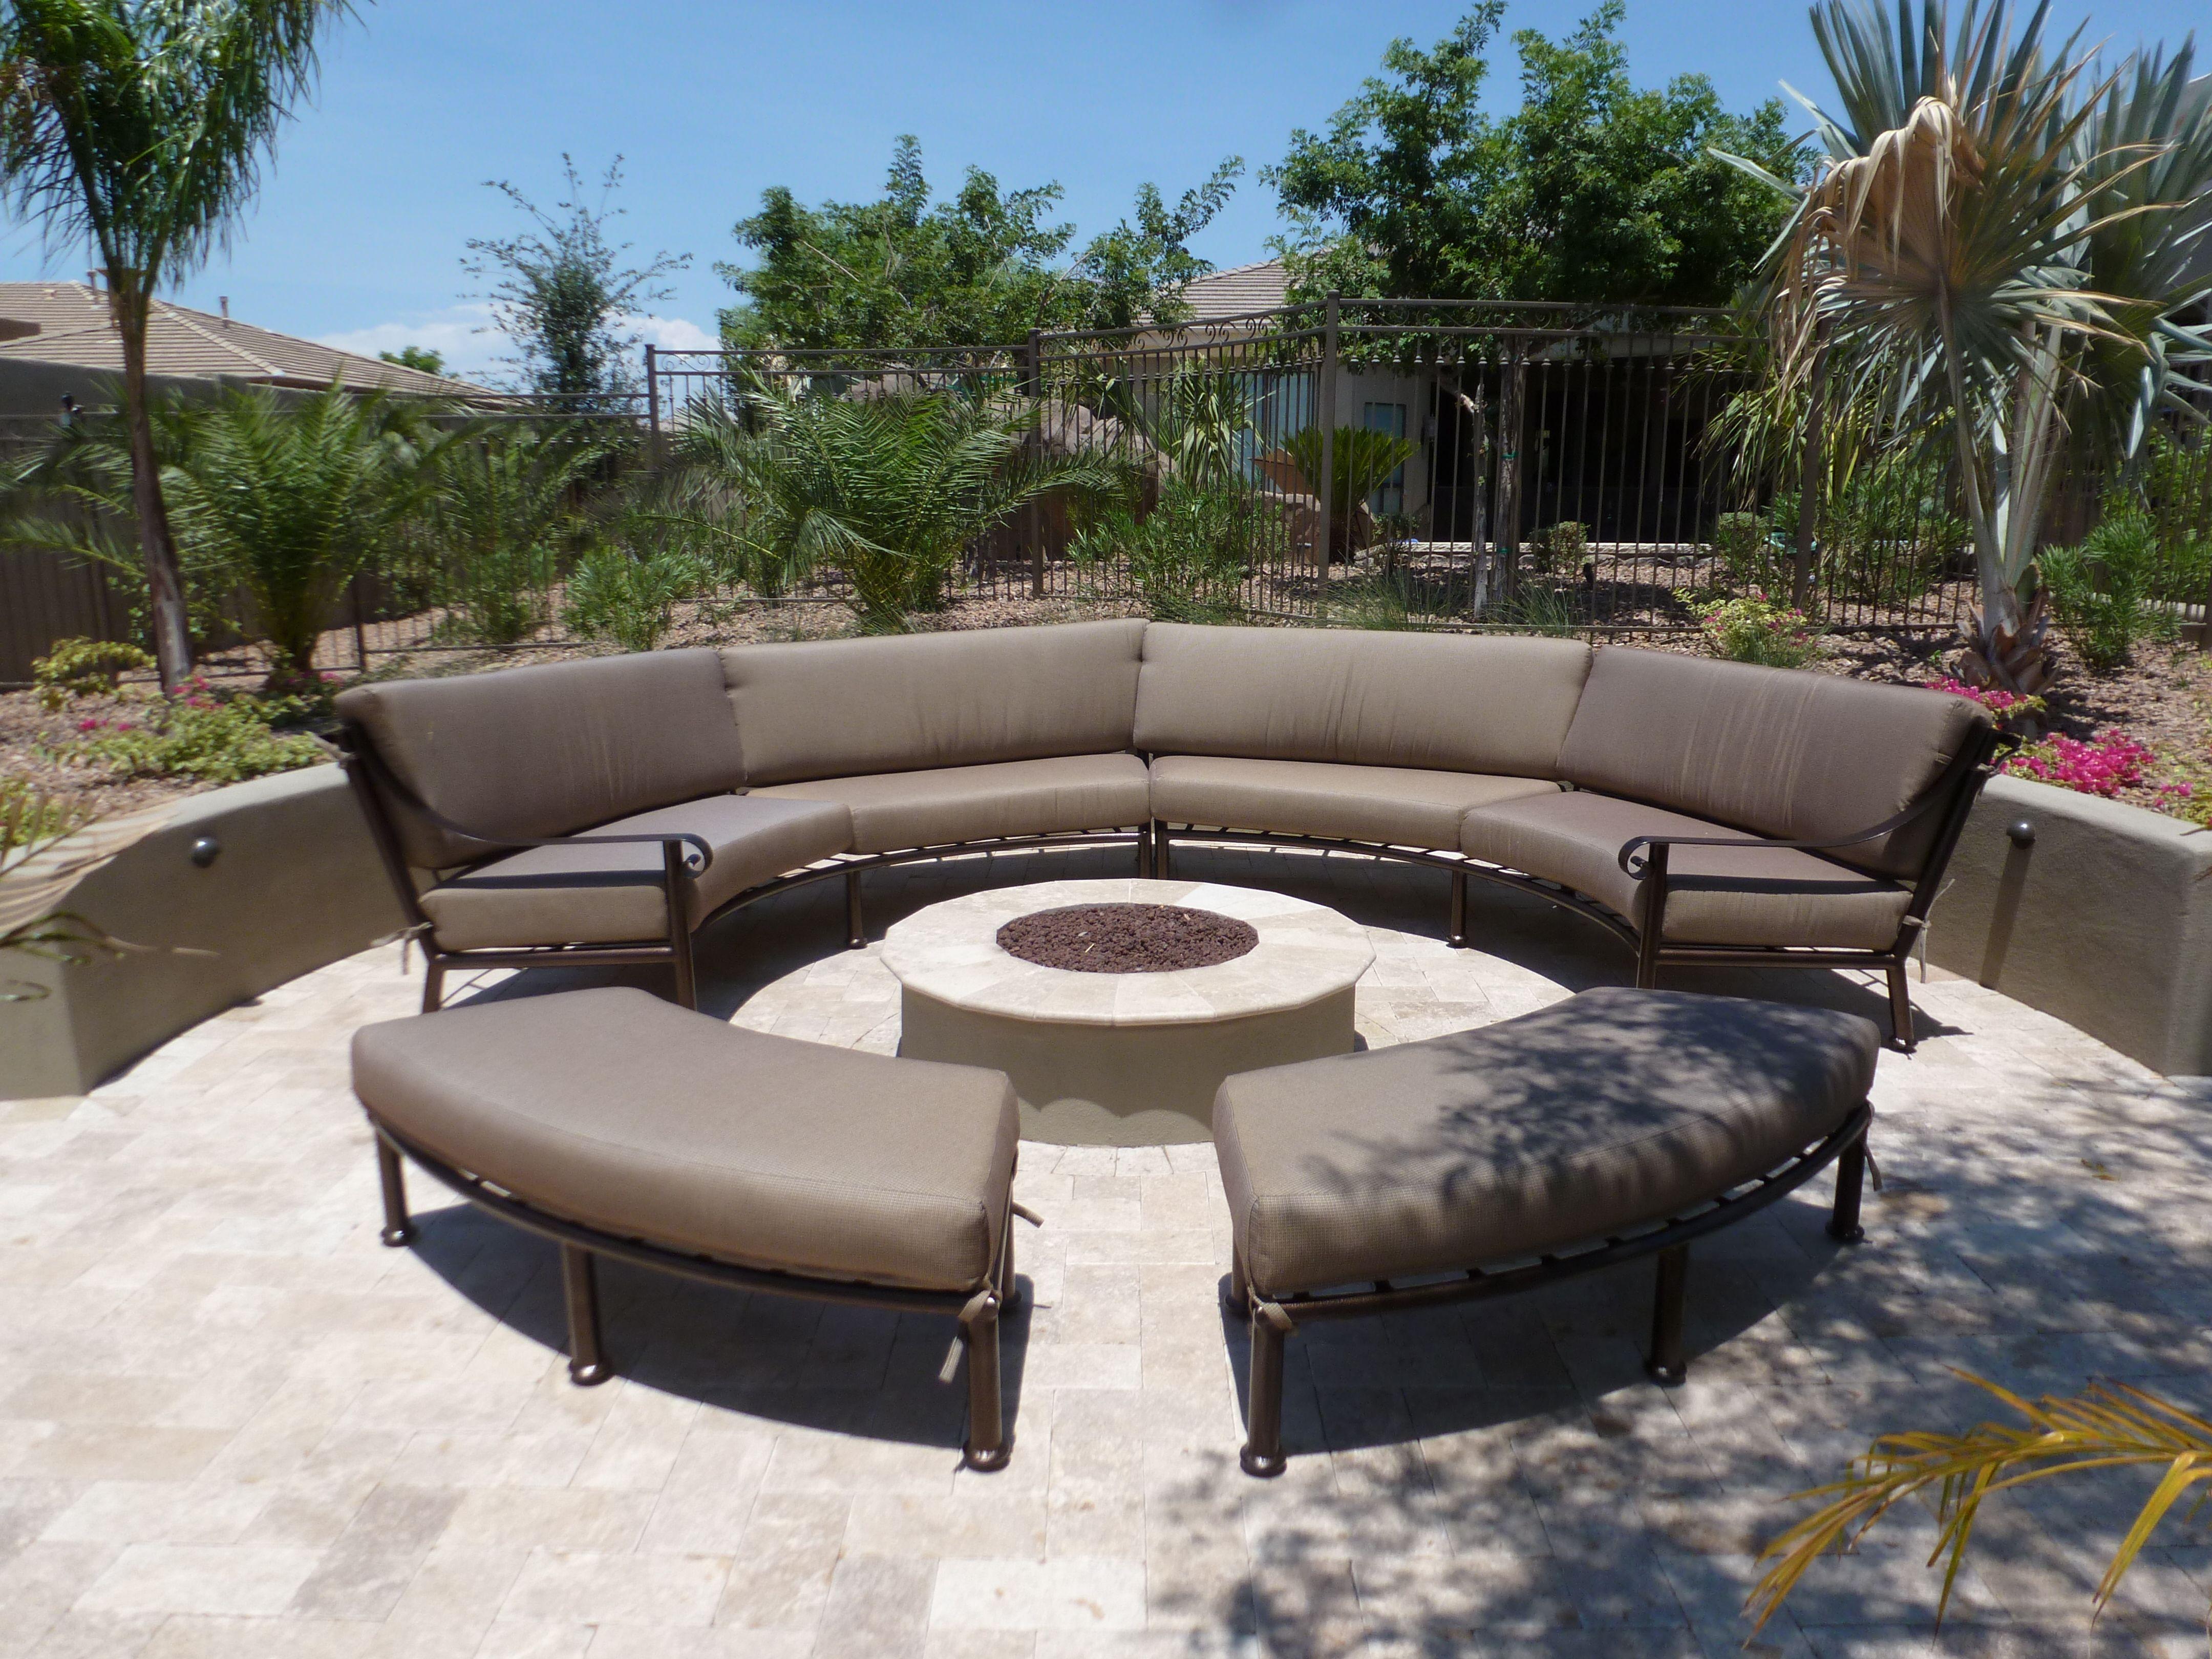 Custom Curved Outdoor Furniture Sectional Sunbrella Fabric Hand